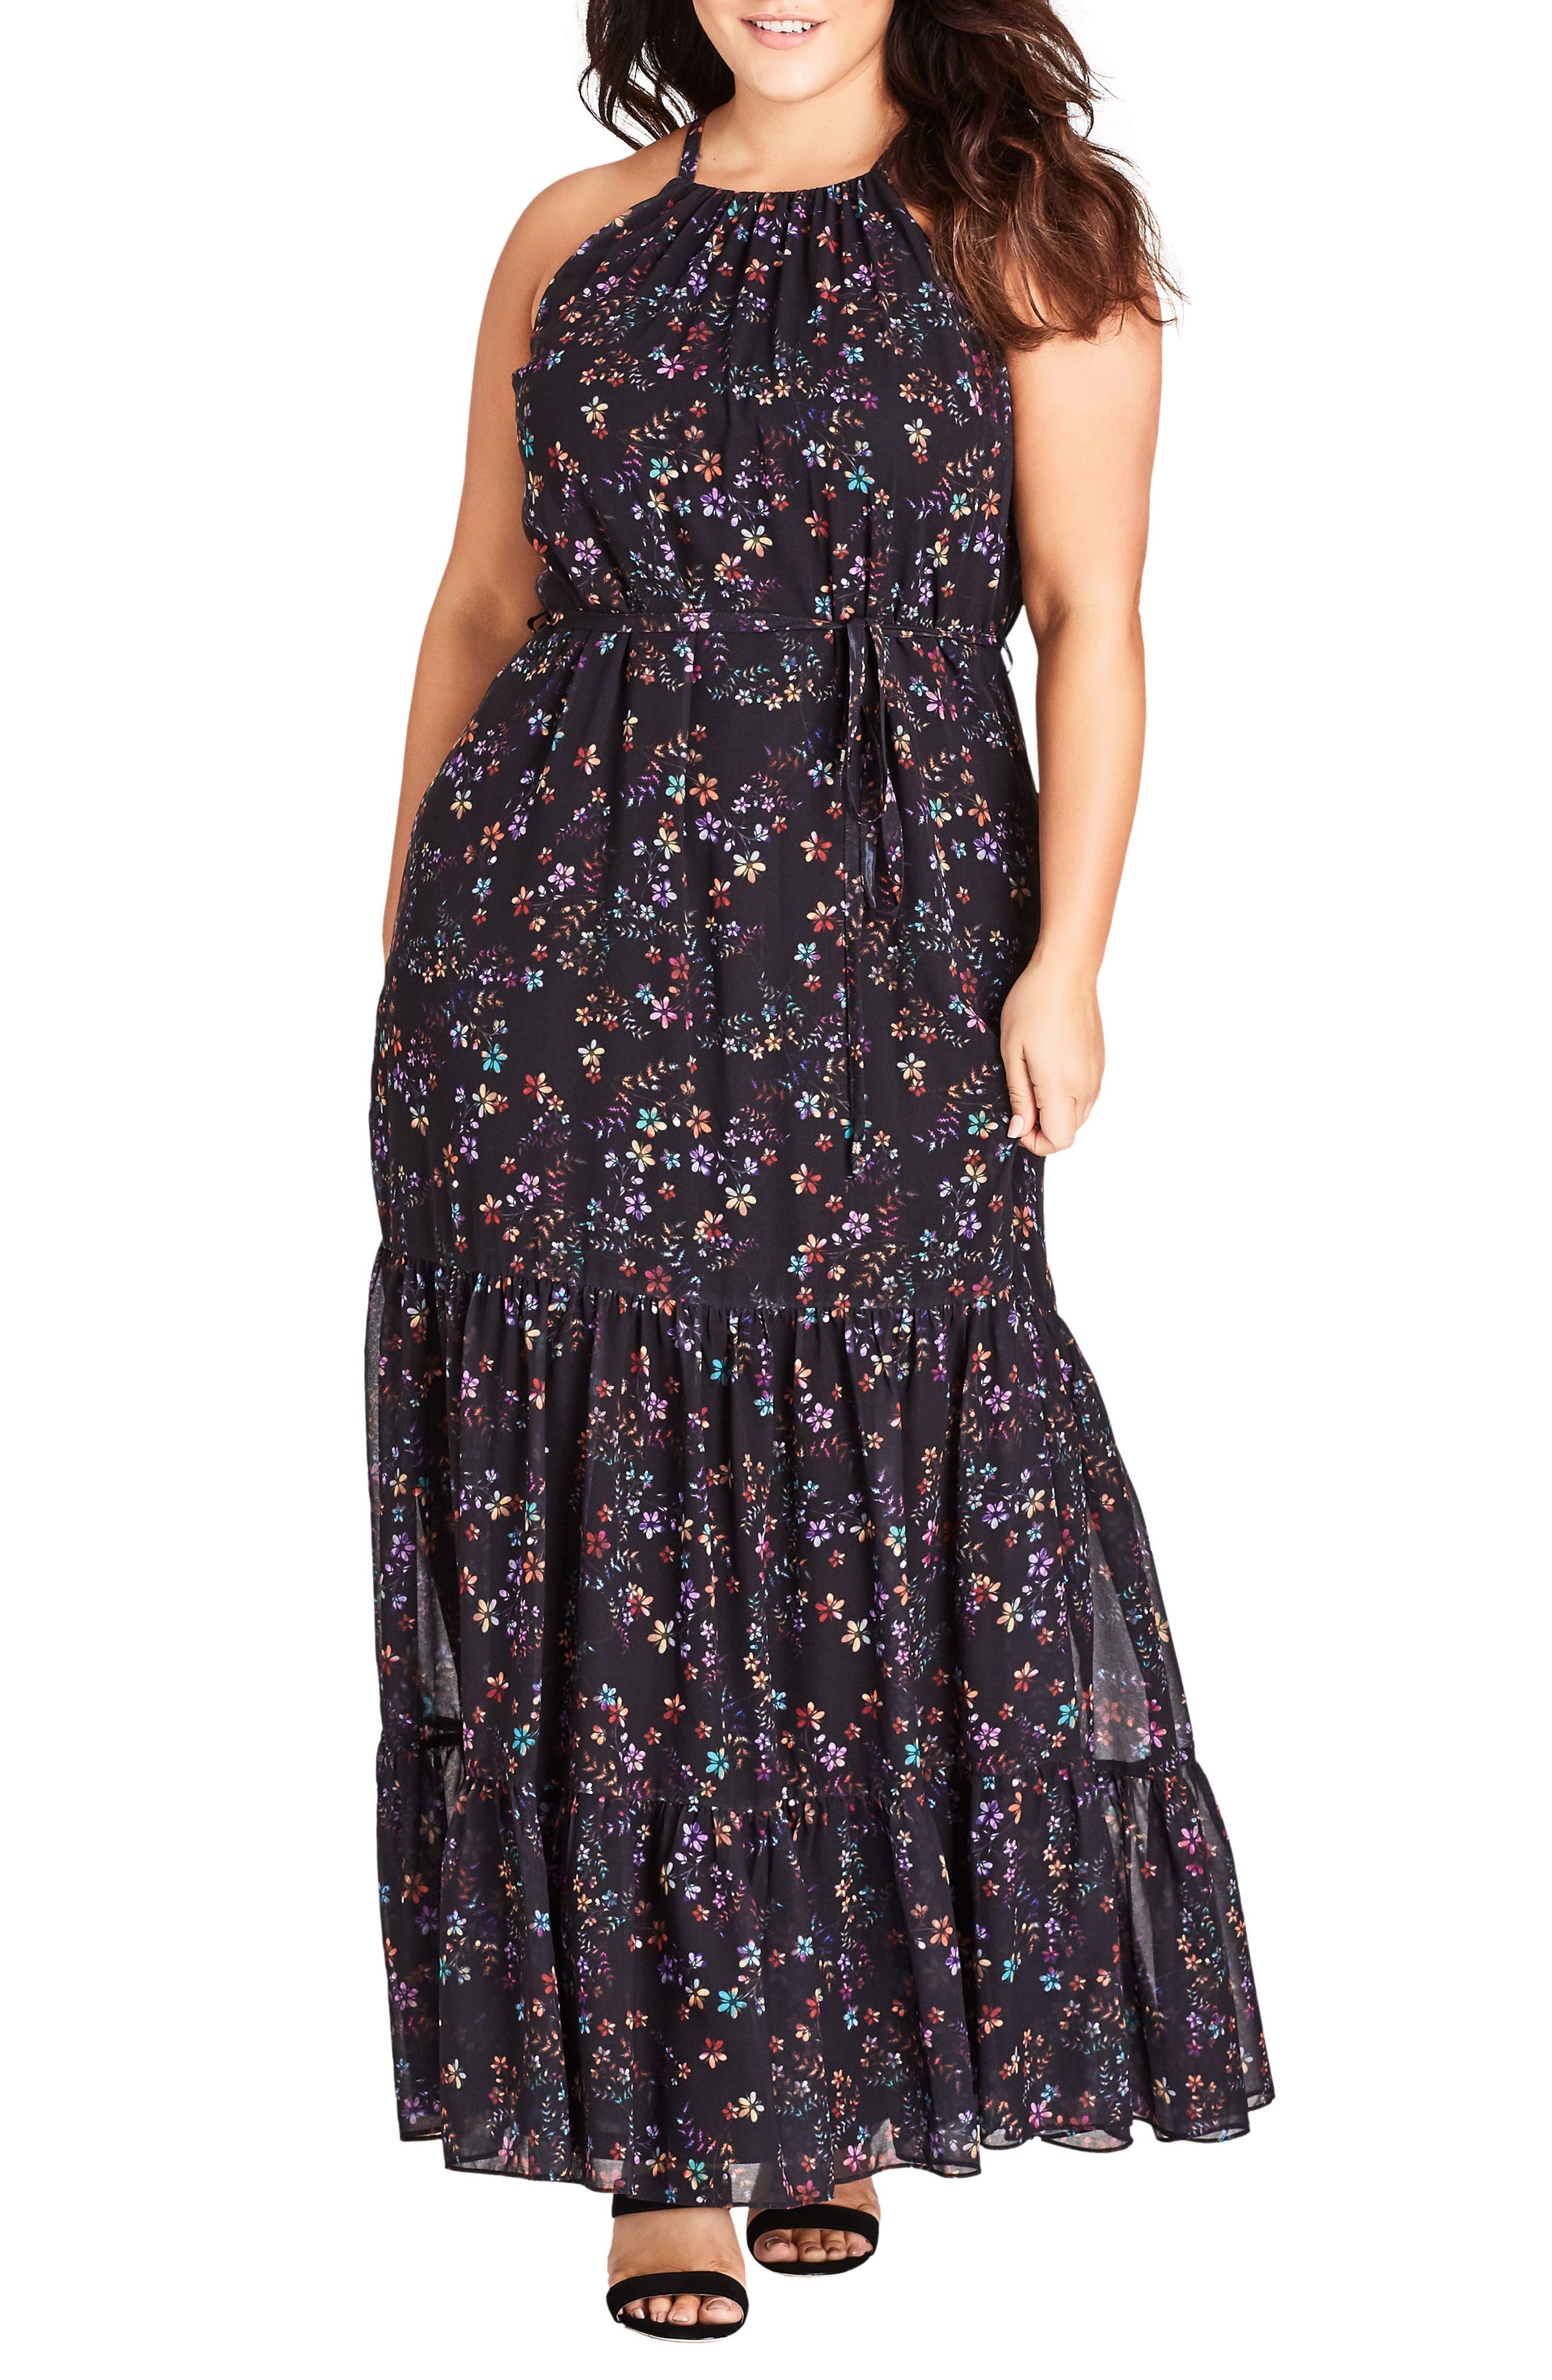 Sweet Dreams Maxi Dress,                             Main thumbnail 1, color,                             Dreamy Floral